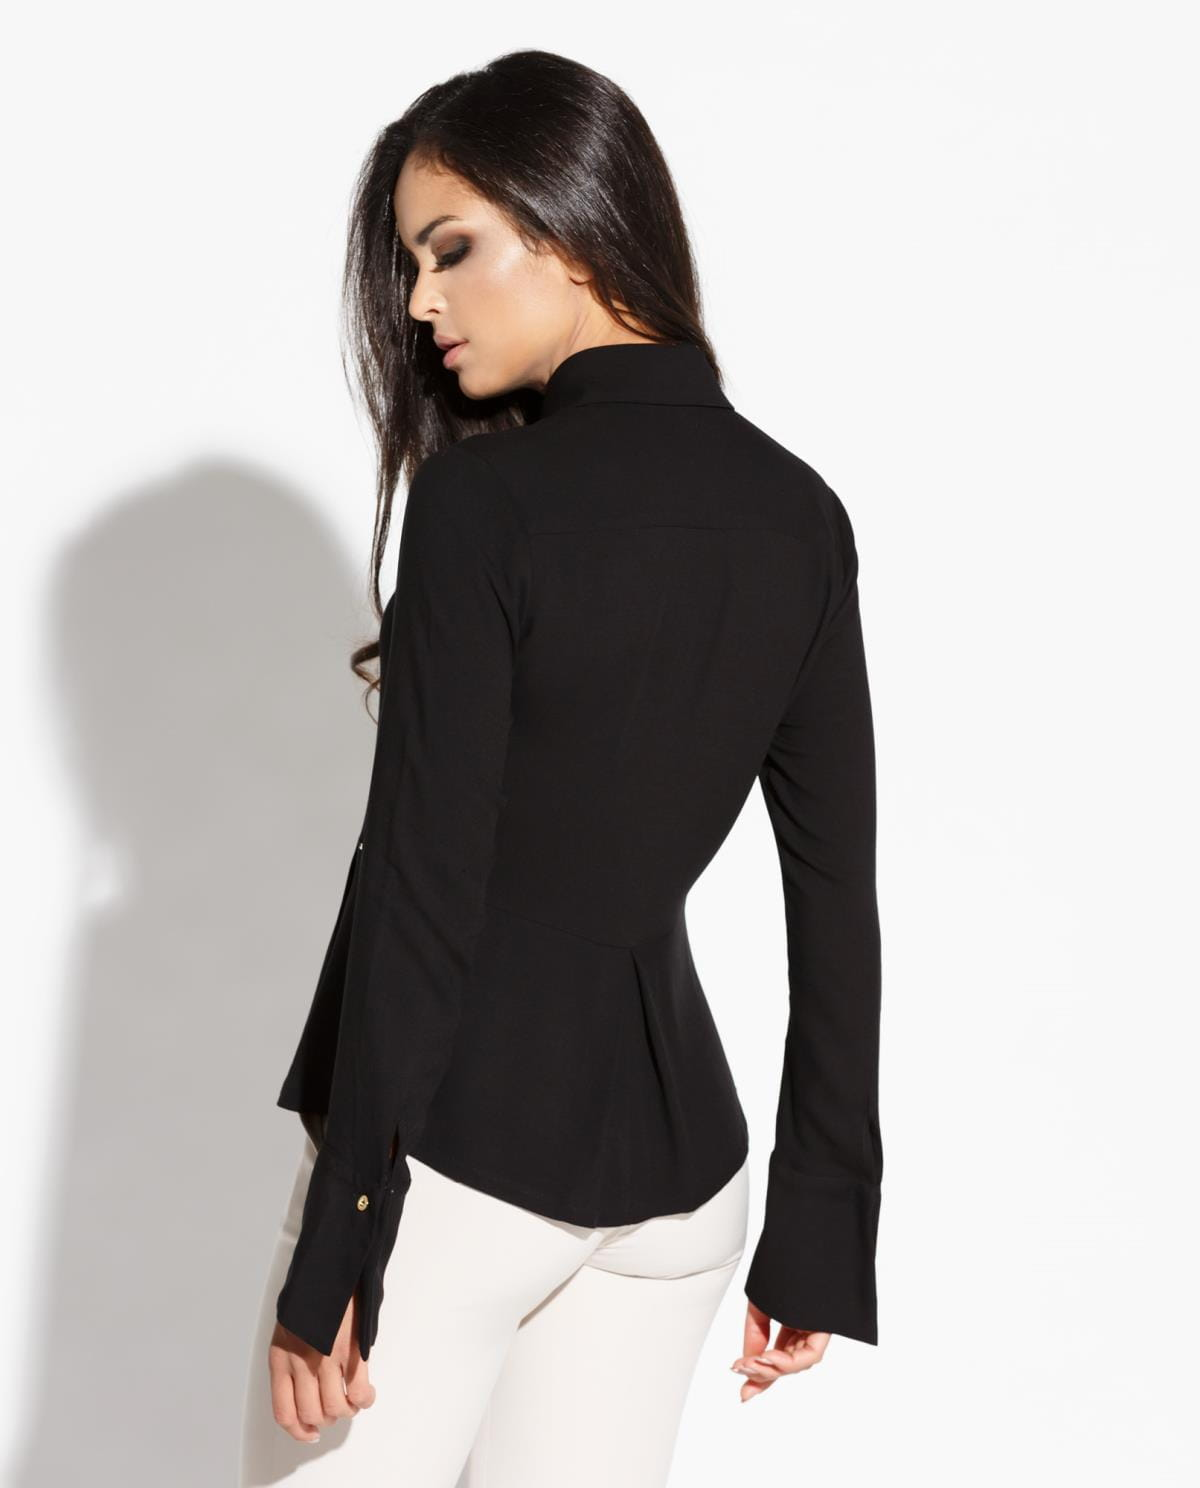 2e6639c331db26 ... koszula, damska, czarna, modne, biura, sklep, online, besima